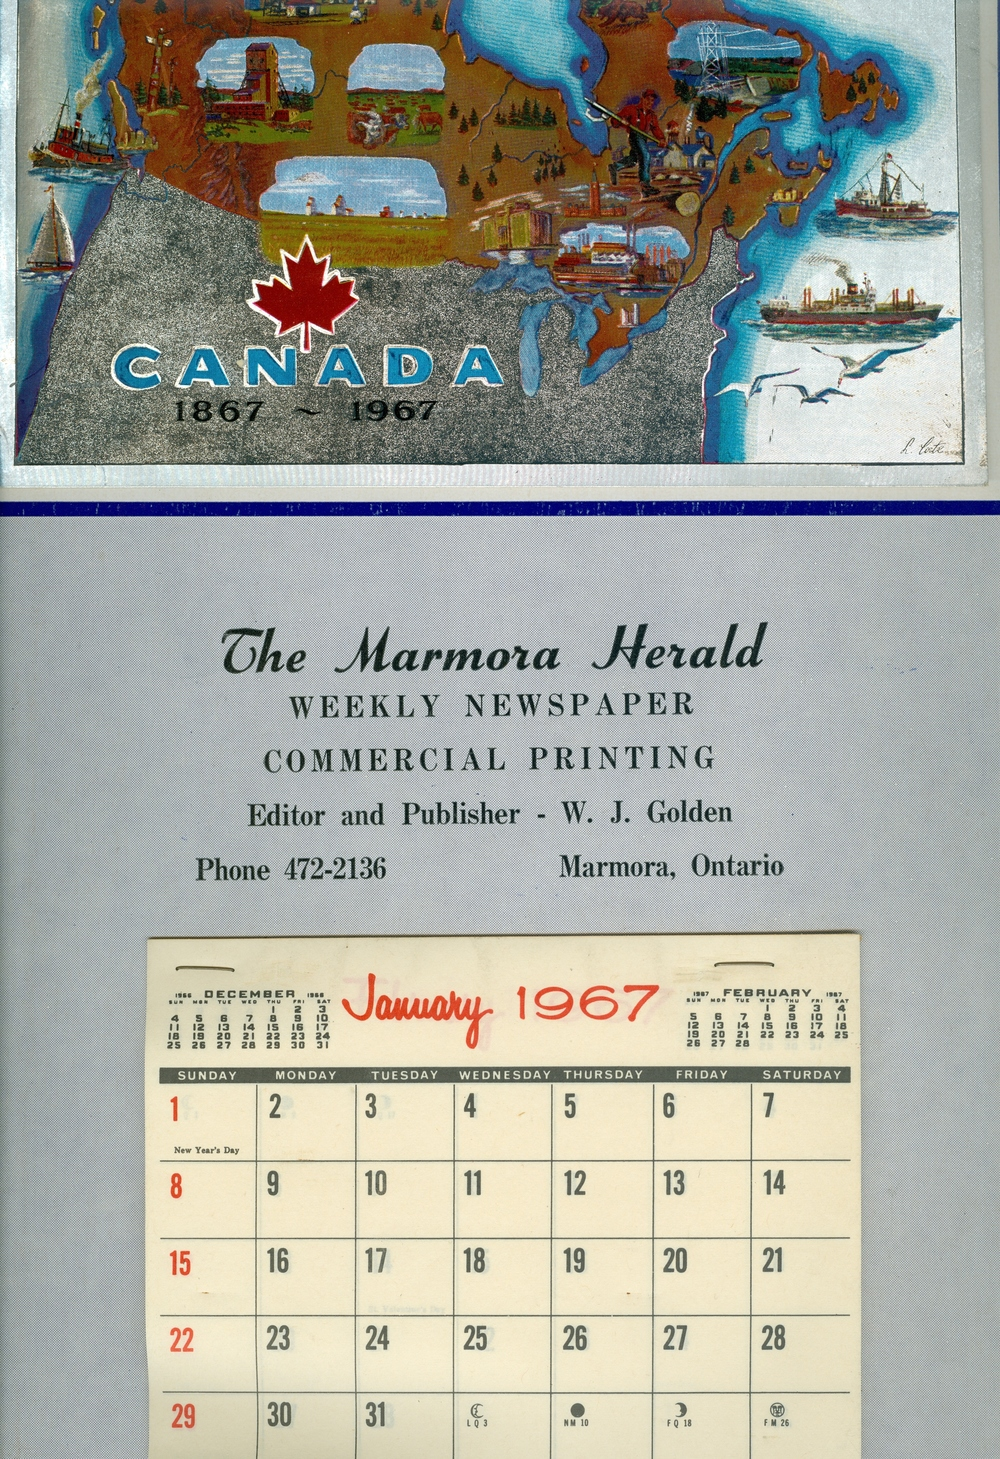 Marmora Business,  Marmora Herald,  1967.jpg